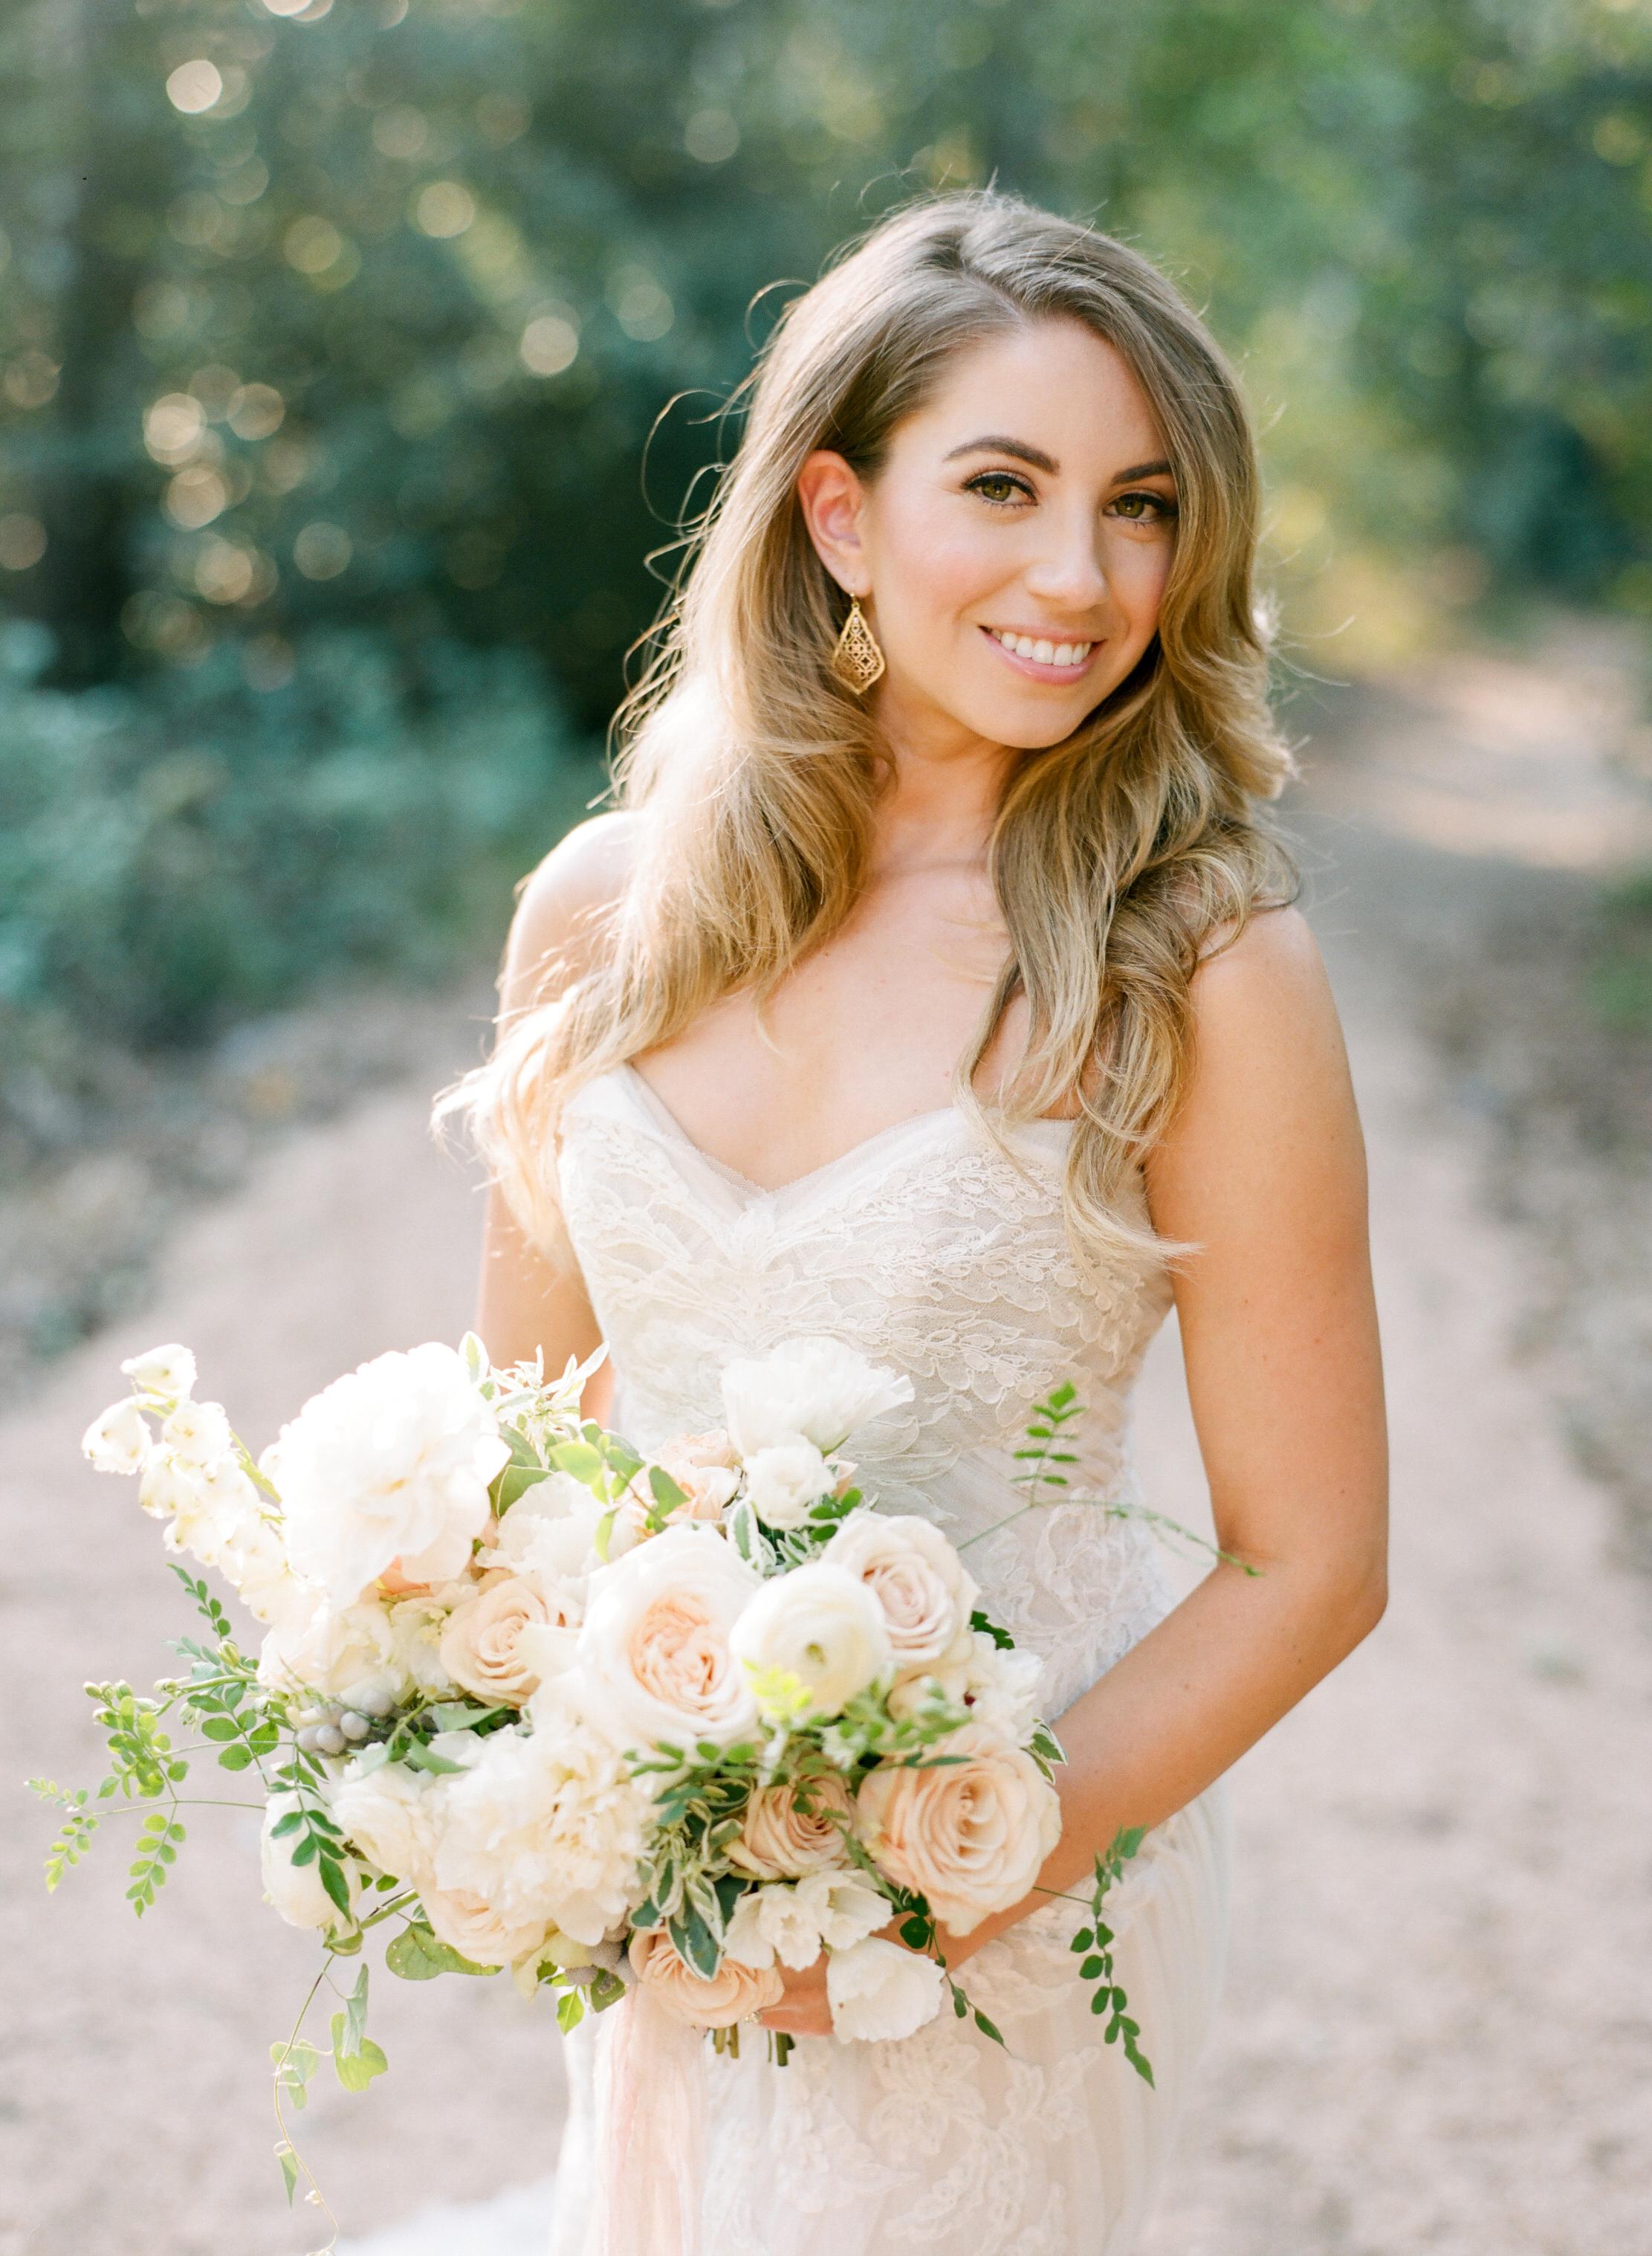 dana-fernandez-photography-the-wedding-chicks-film-houston-wedding-photography-destination-15.jpg